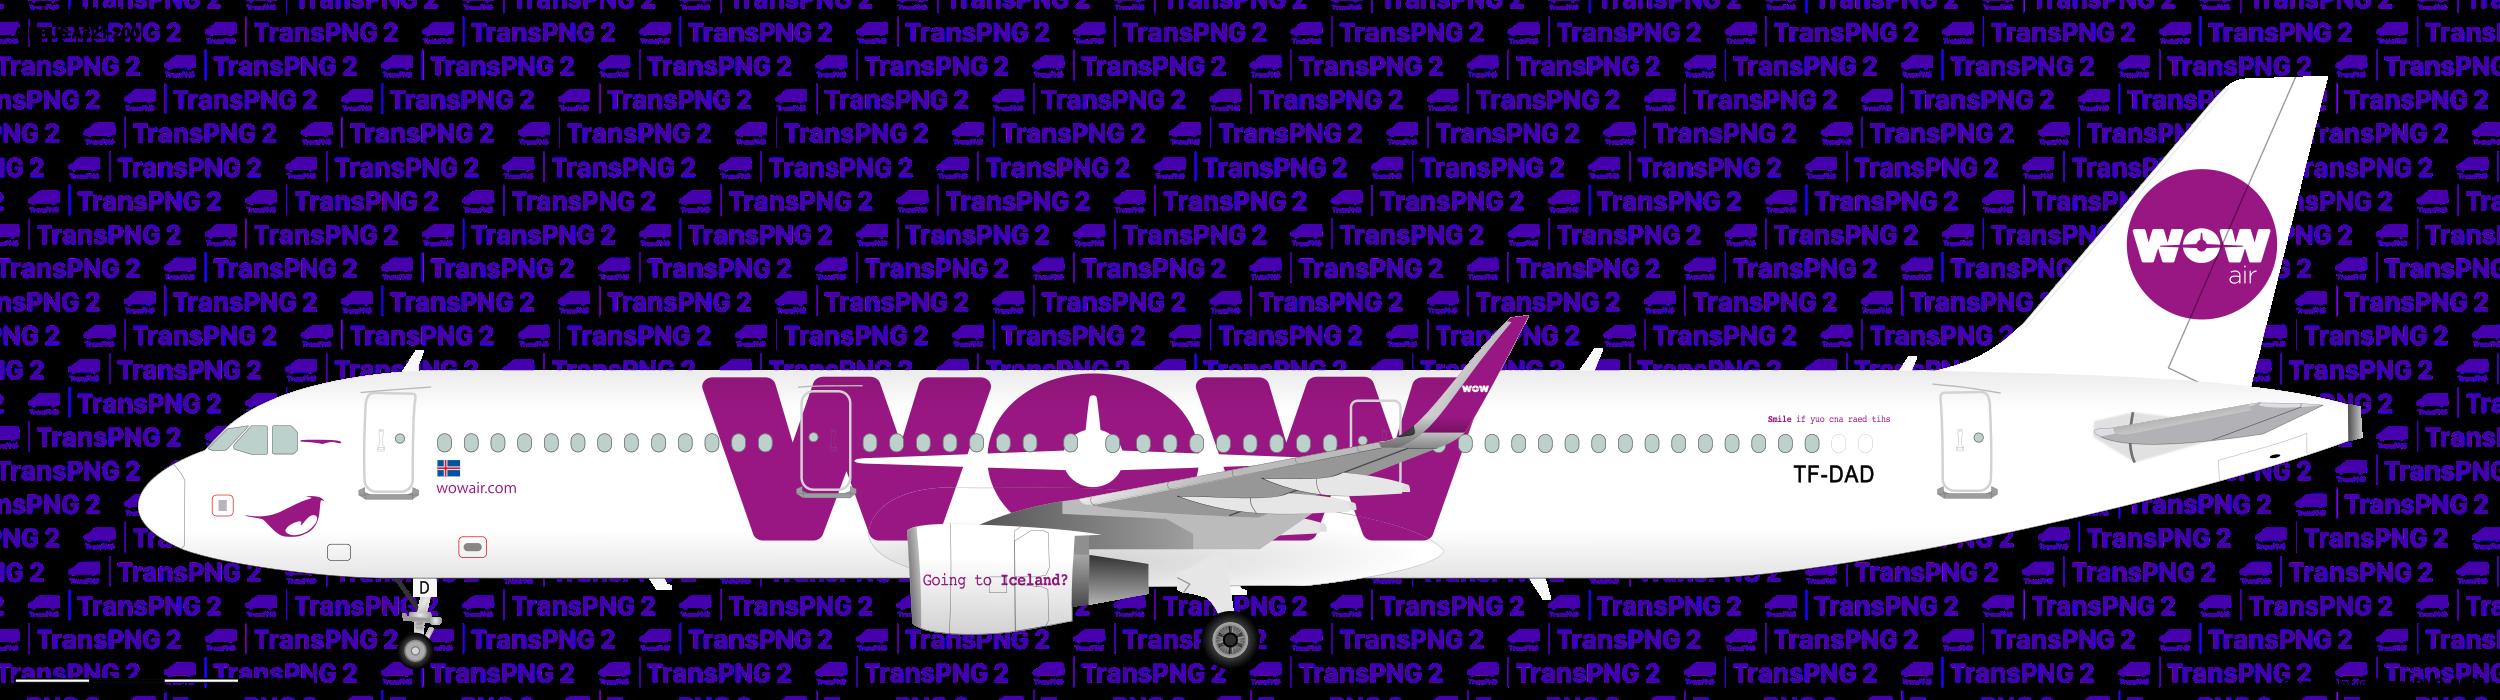 Airplane 25116